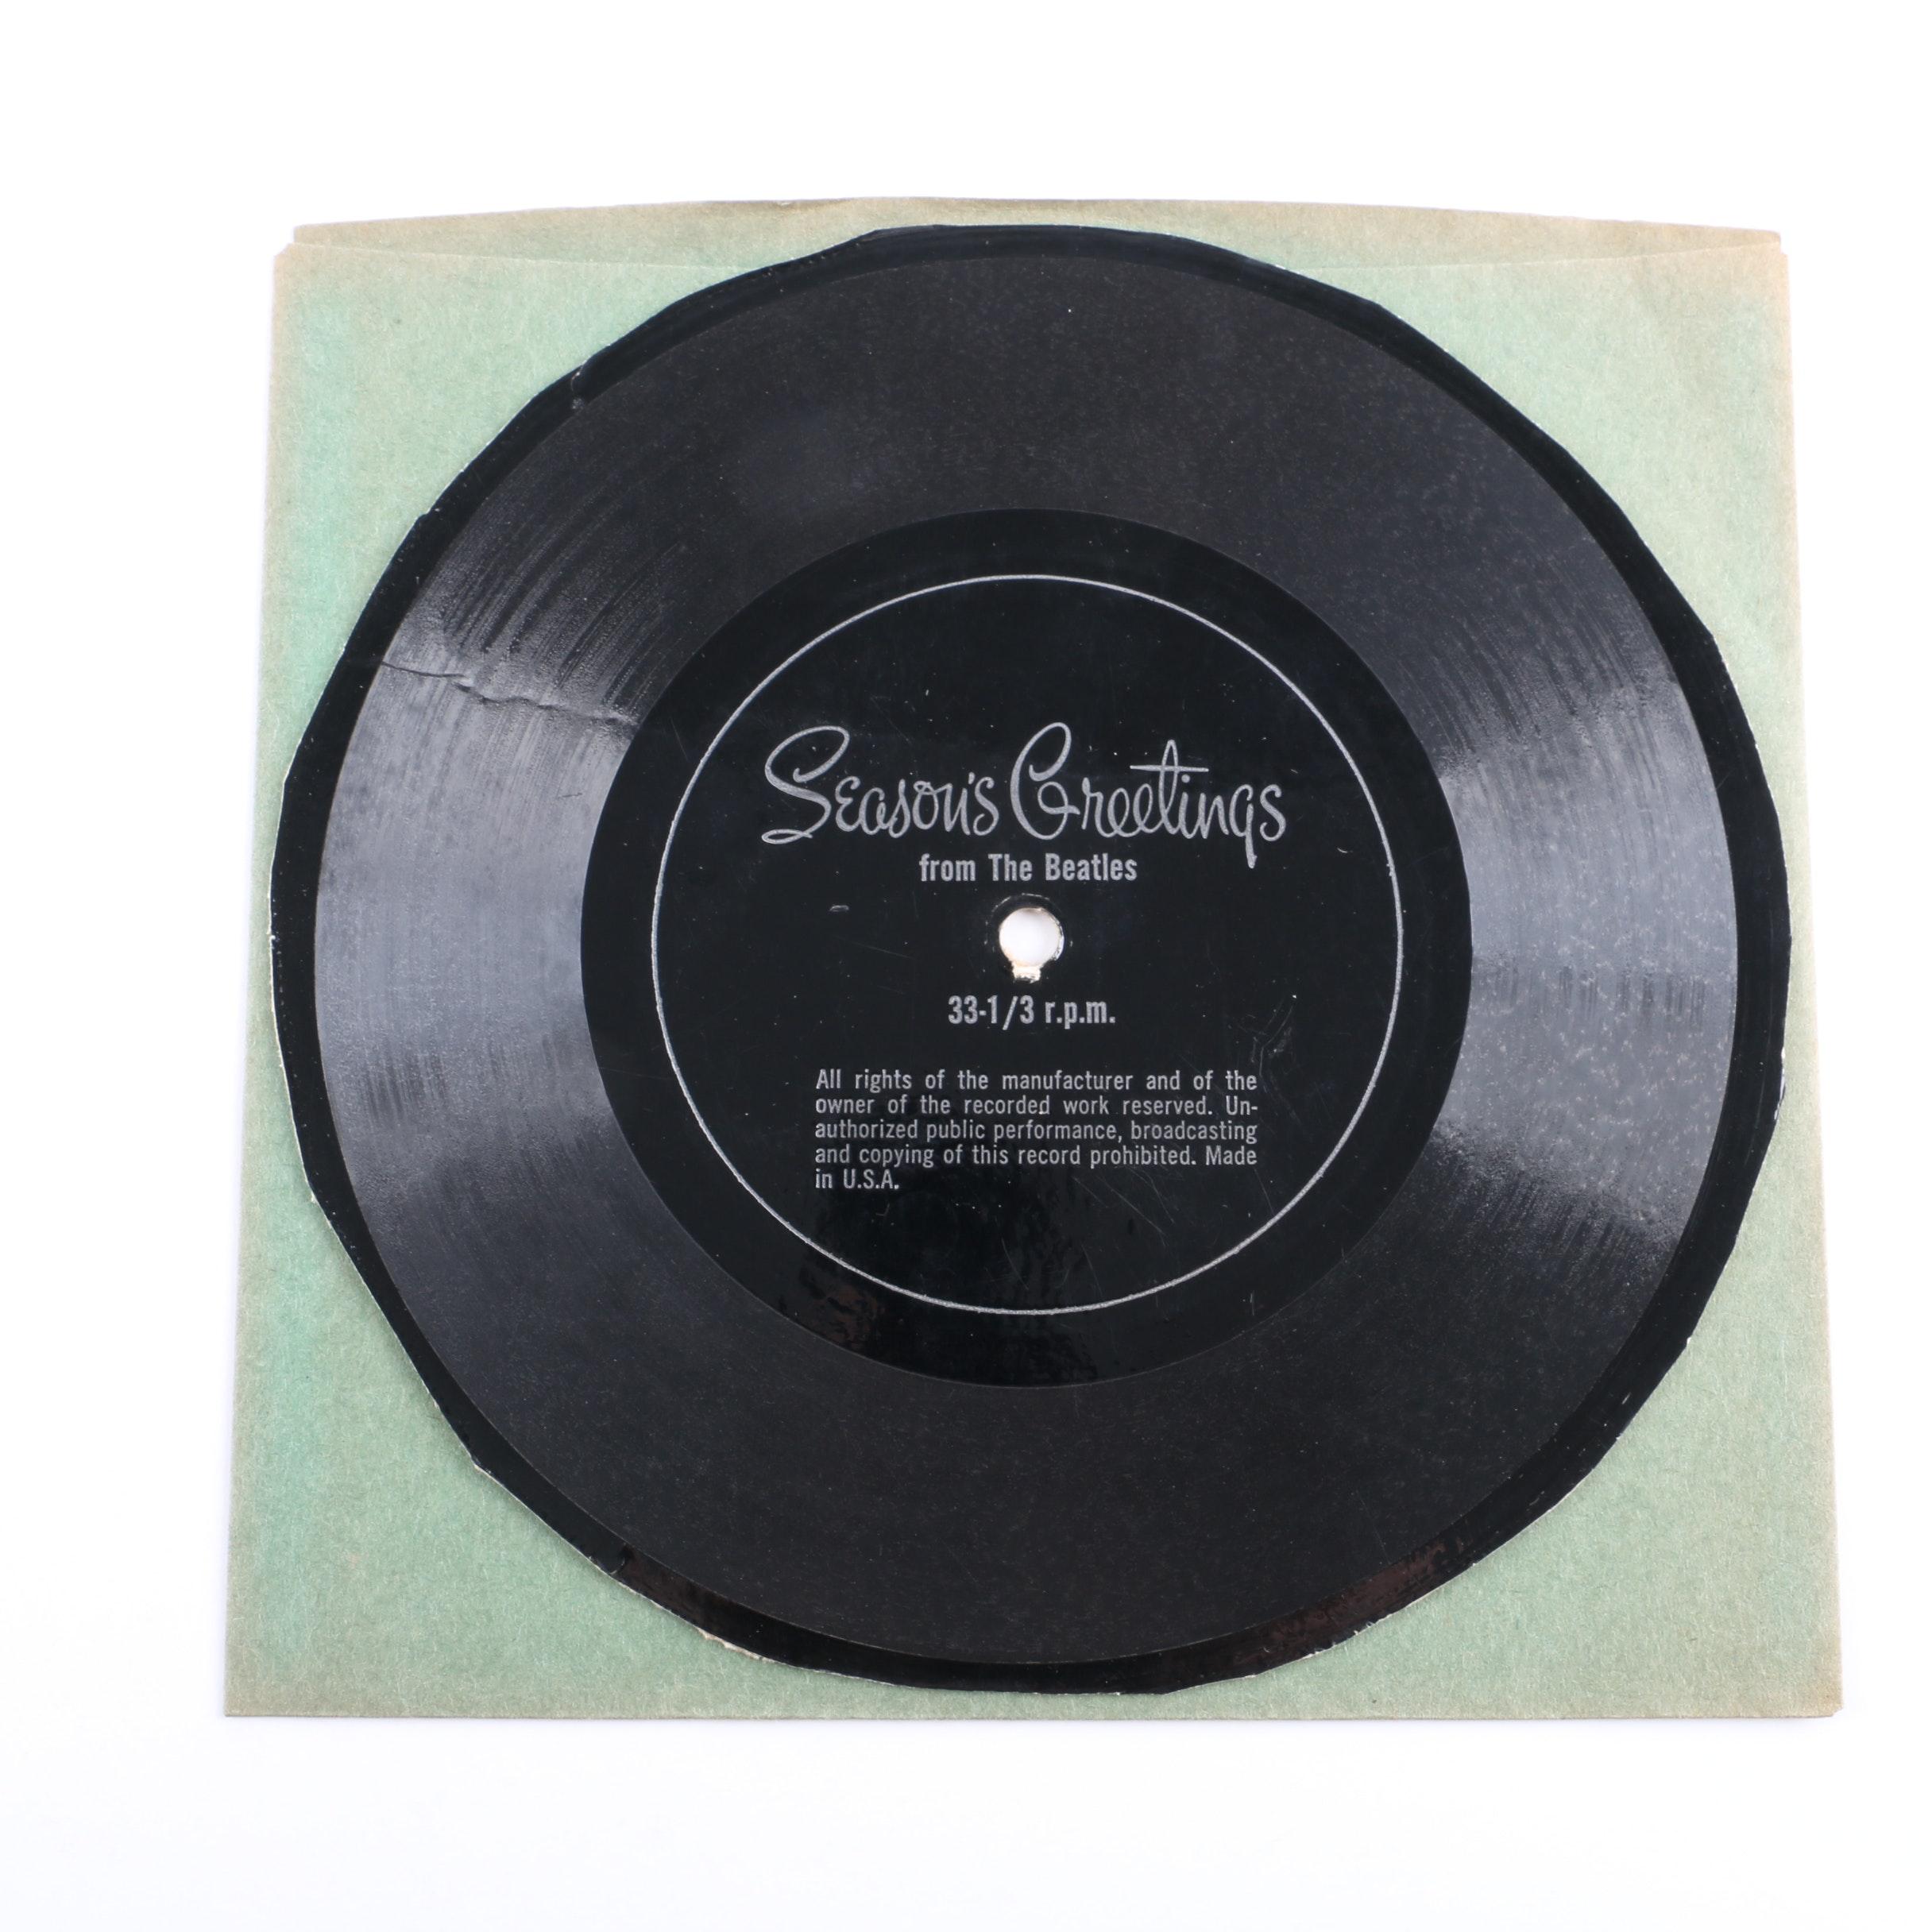 "The Beatles ""Season's Greetings"" 1967 Fan Club One-Sided Flexi Disc"